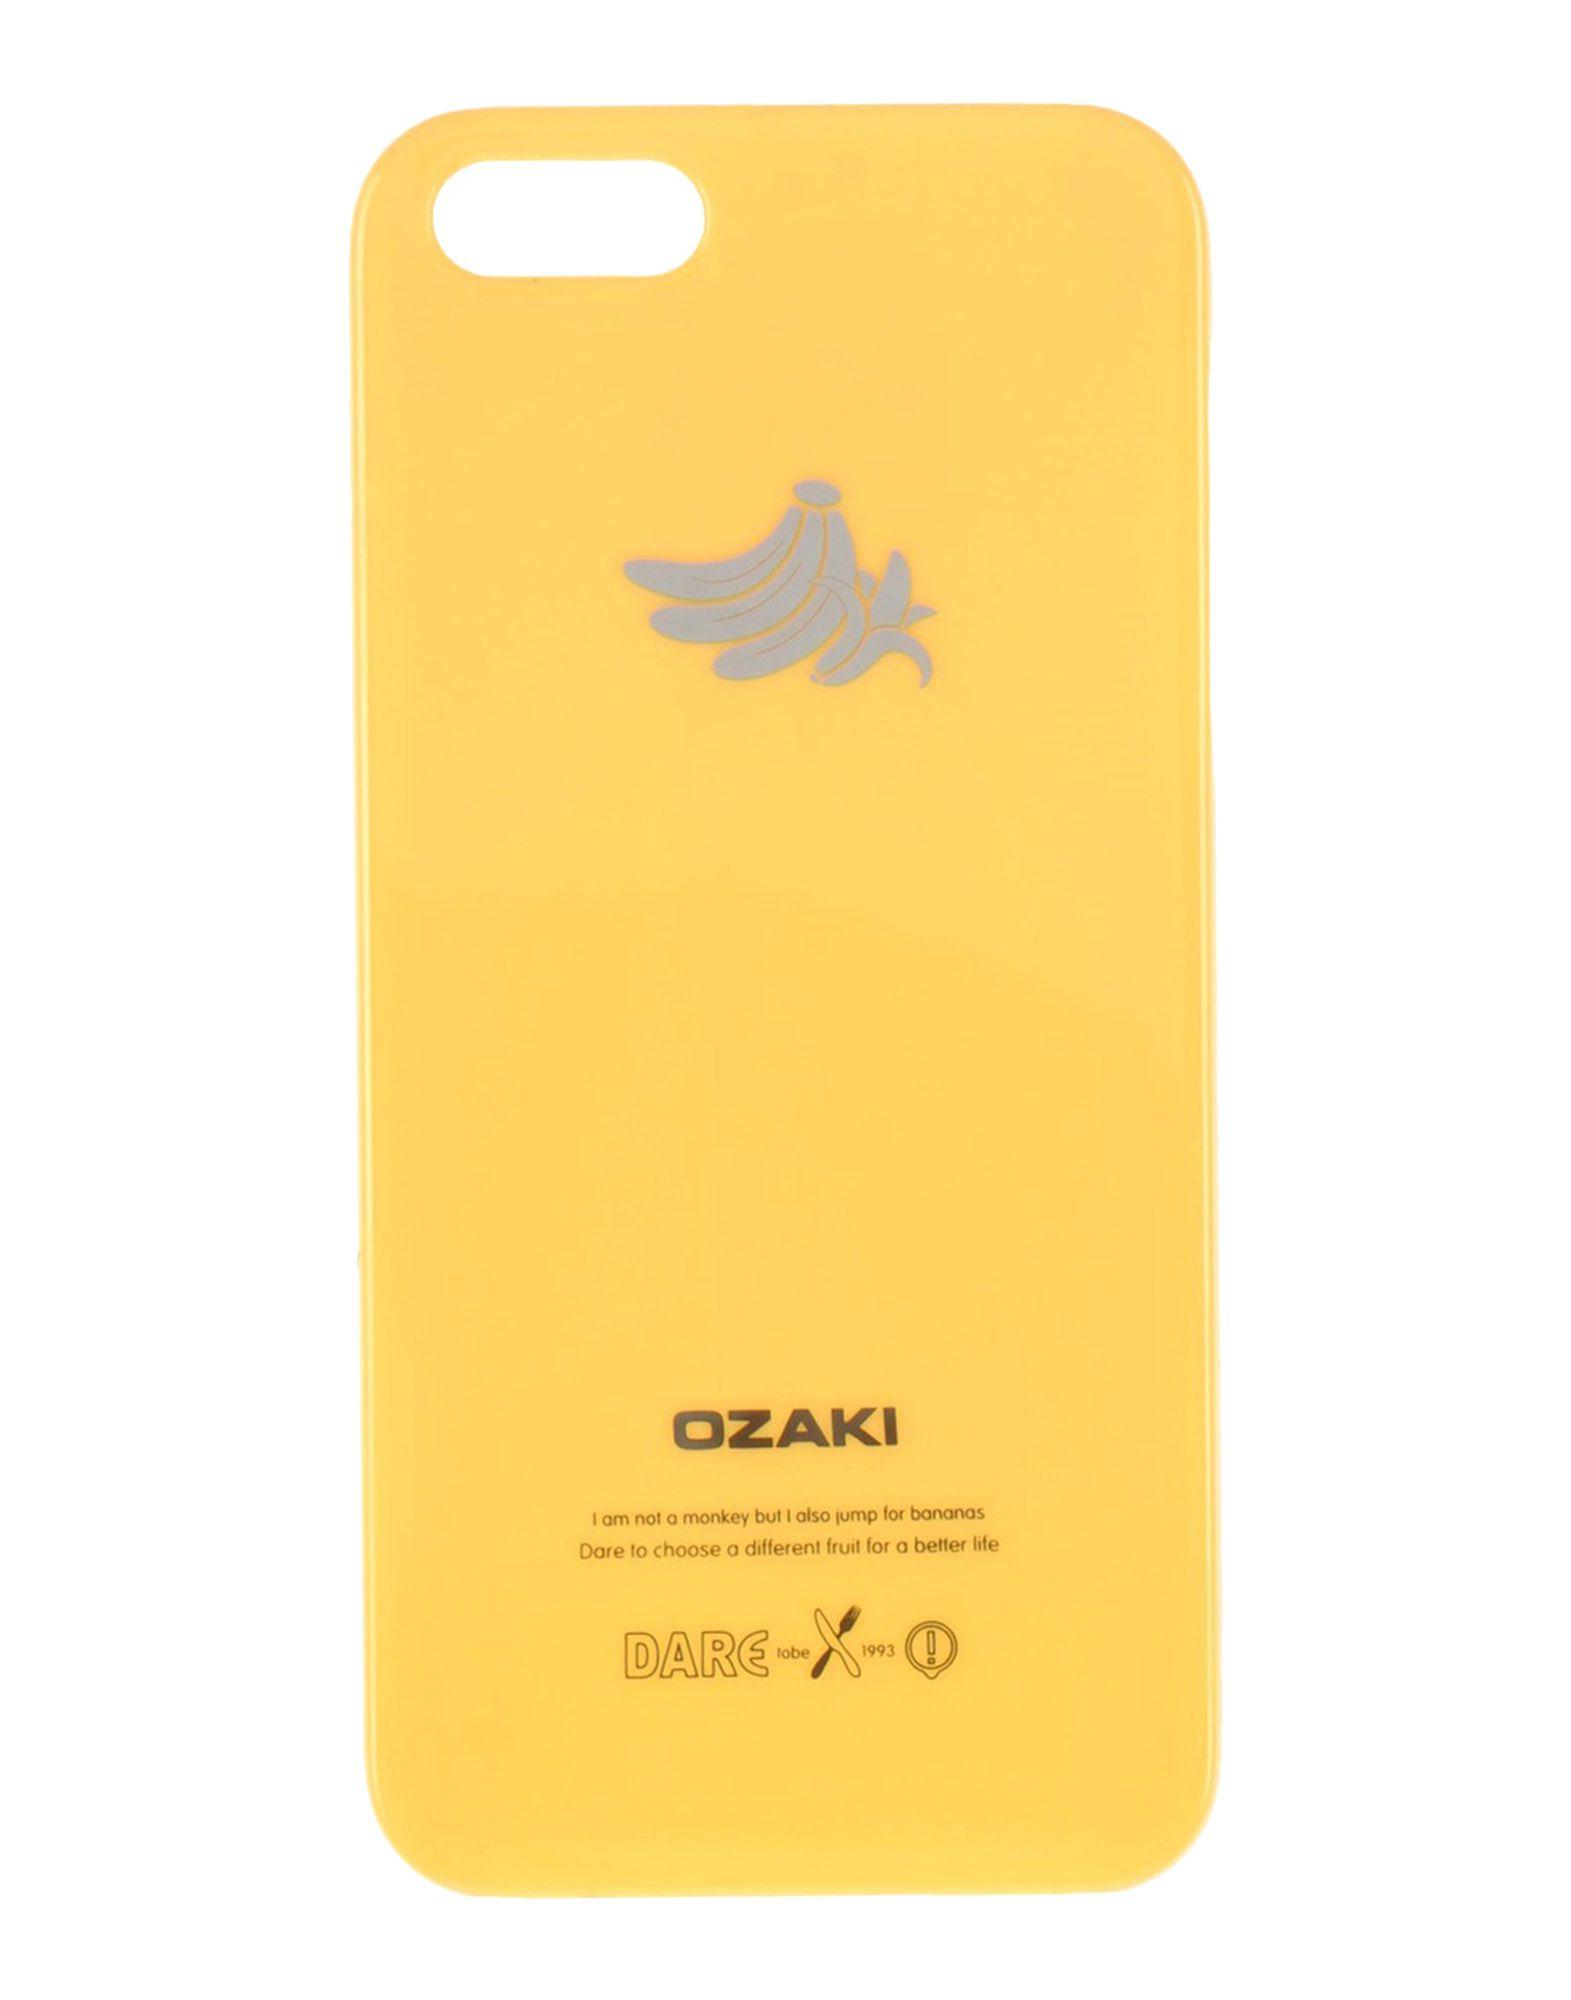 OZAKI Чехол чехол накладка для iphone 6 ozaki o coat 0 3 jelly oc555tr пластик прозрачный